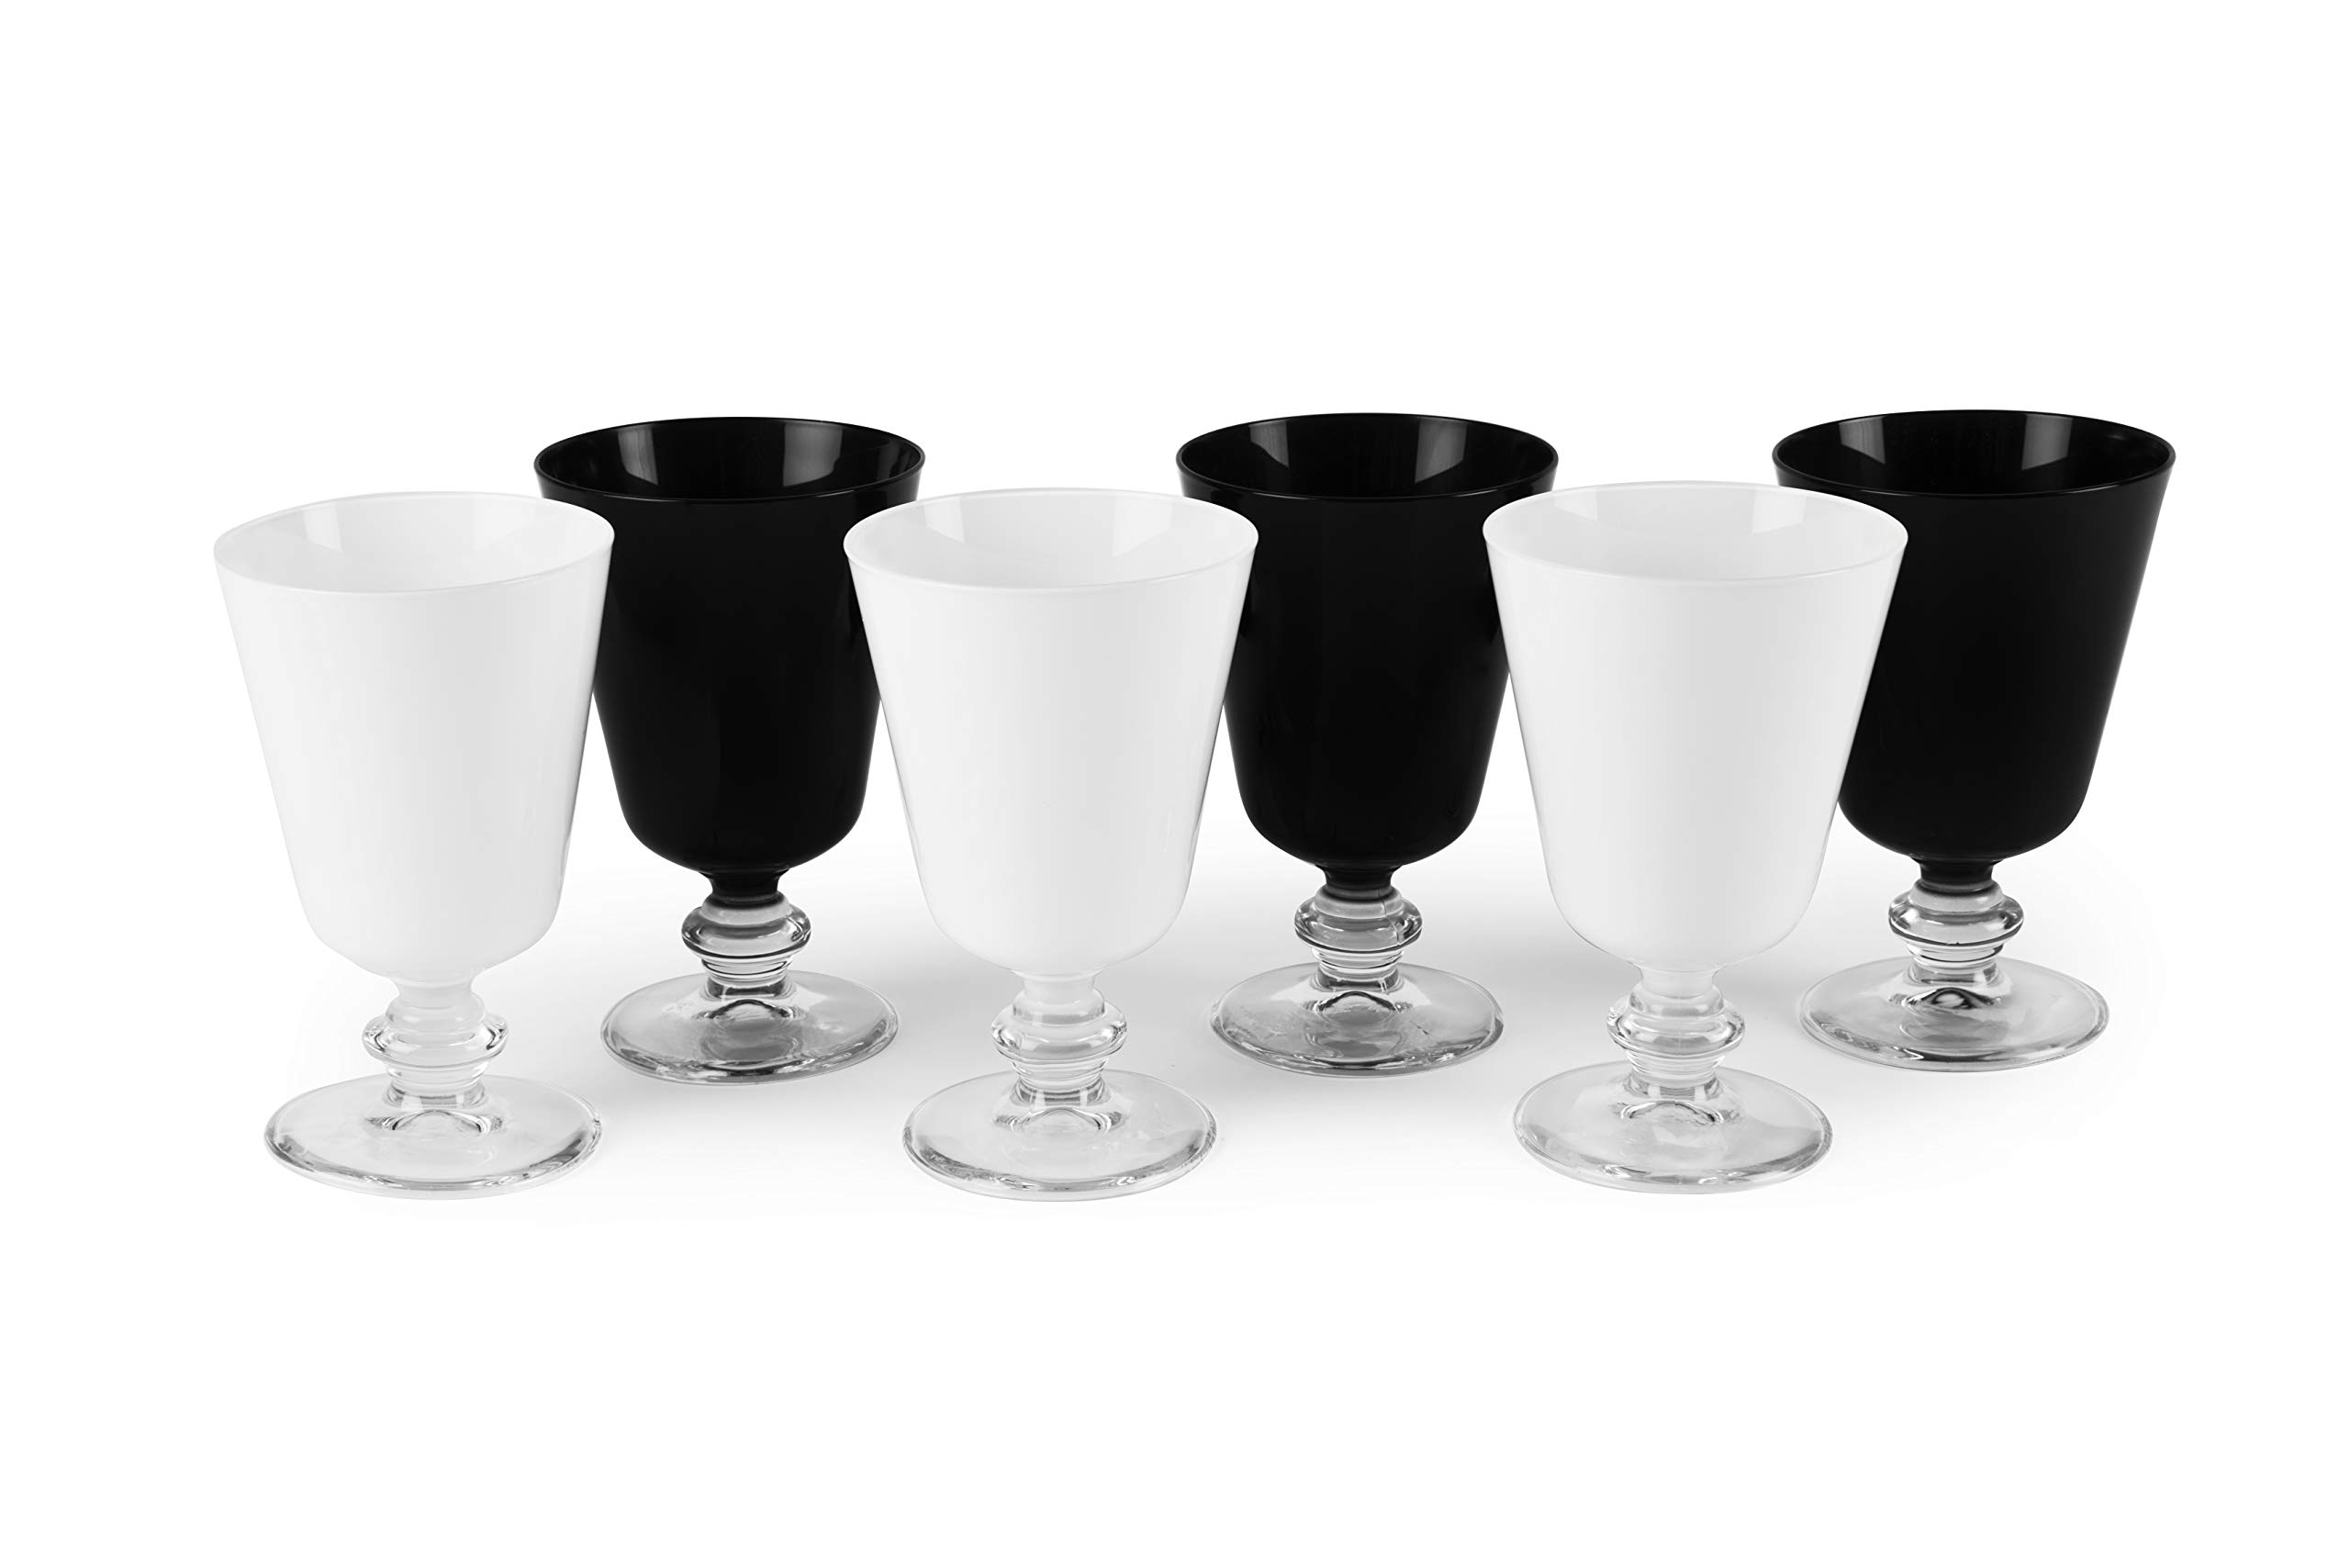 Excelsa Noble Wine Set of 6 Glasses, Glass, White and Black